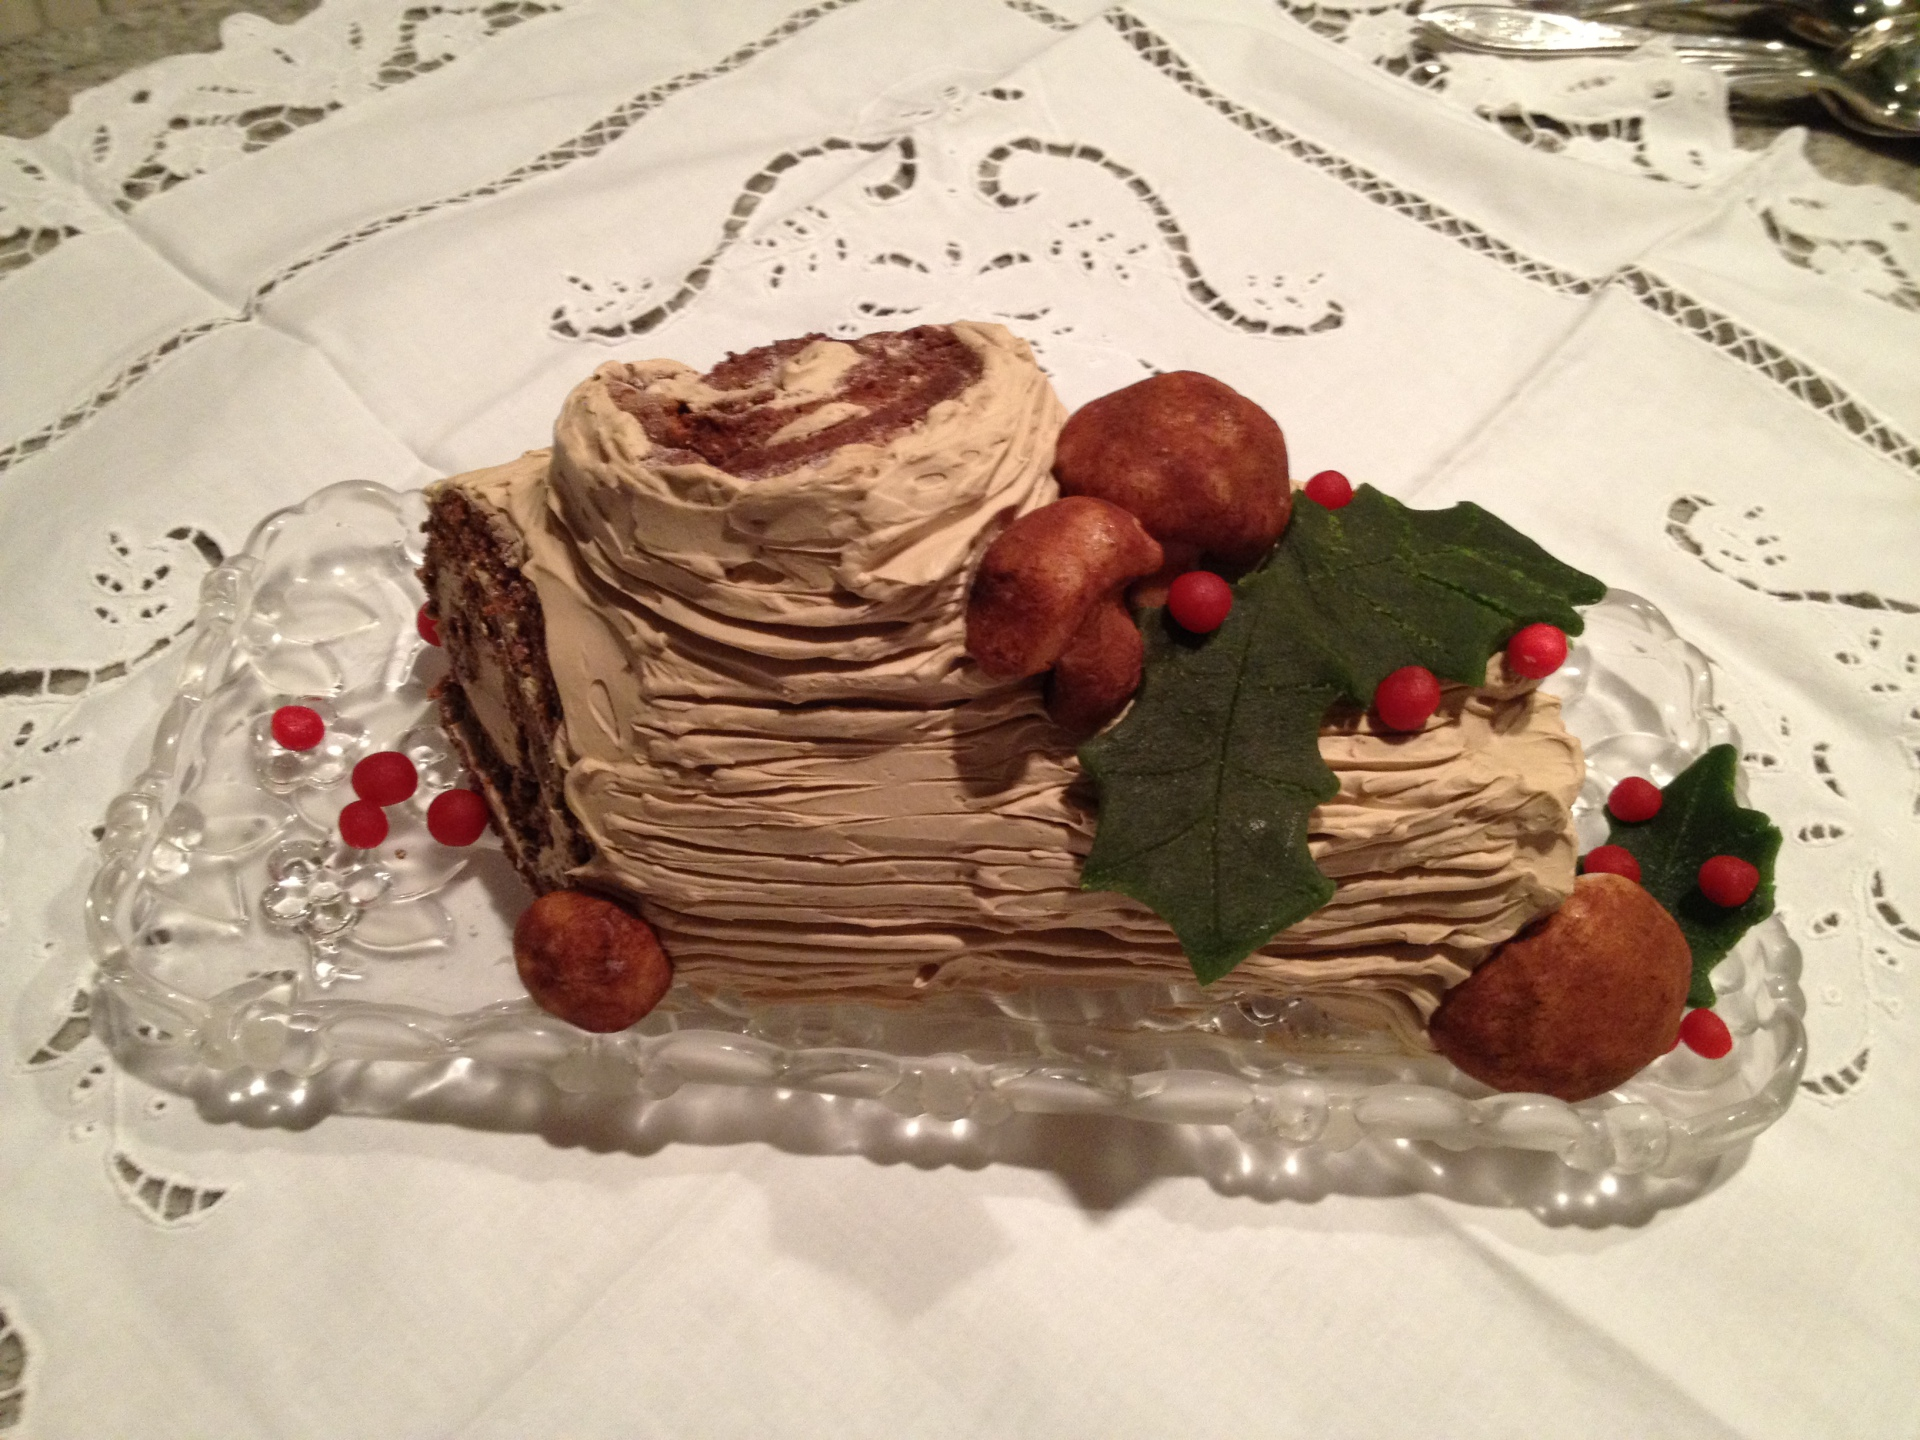 Buche de Noel w/ hand made mushrooms, holly and berries.